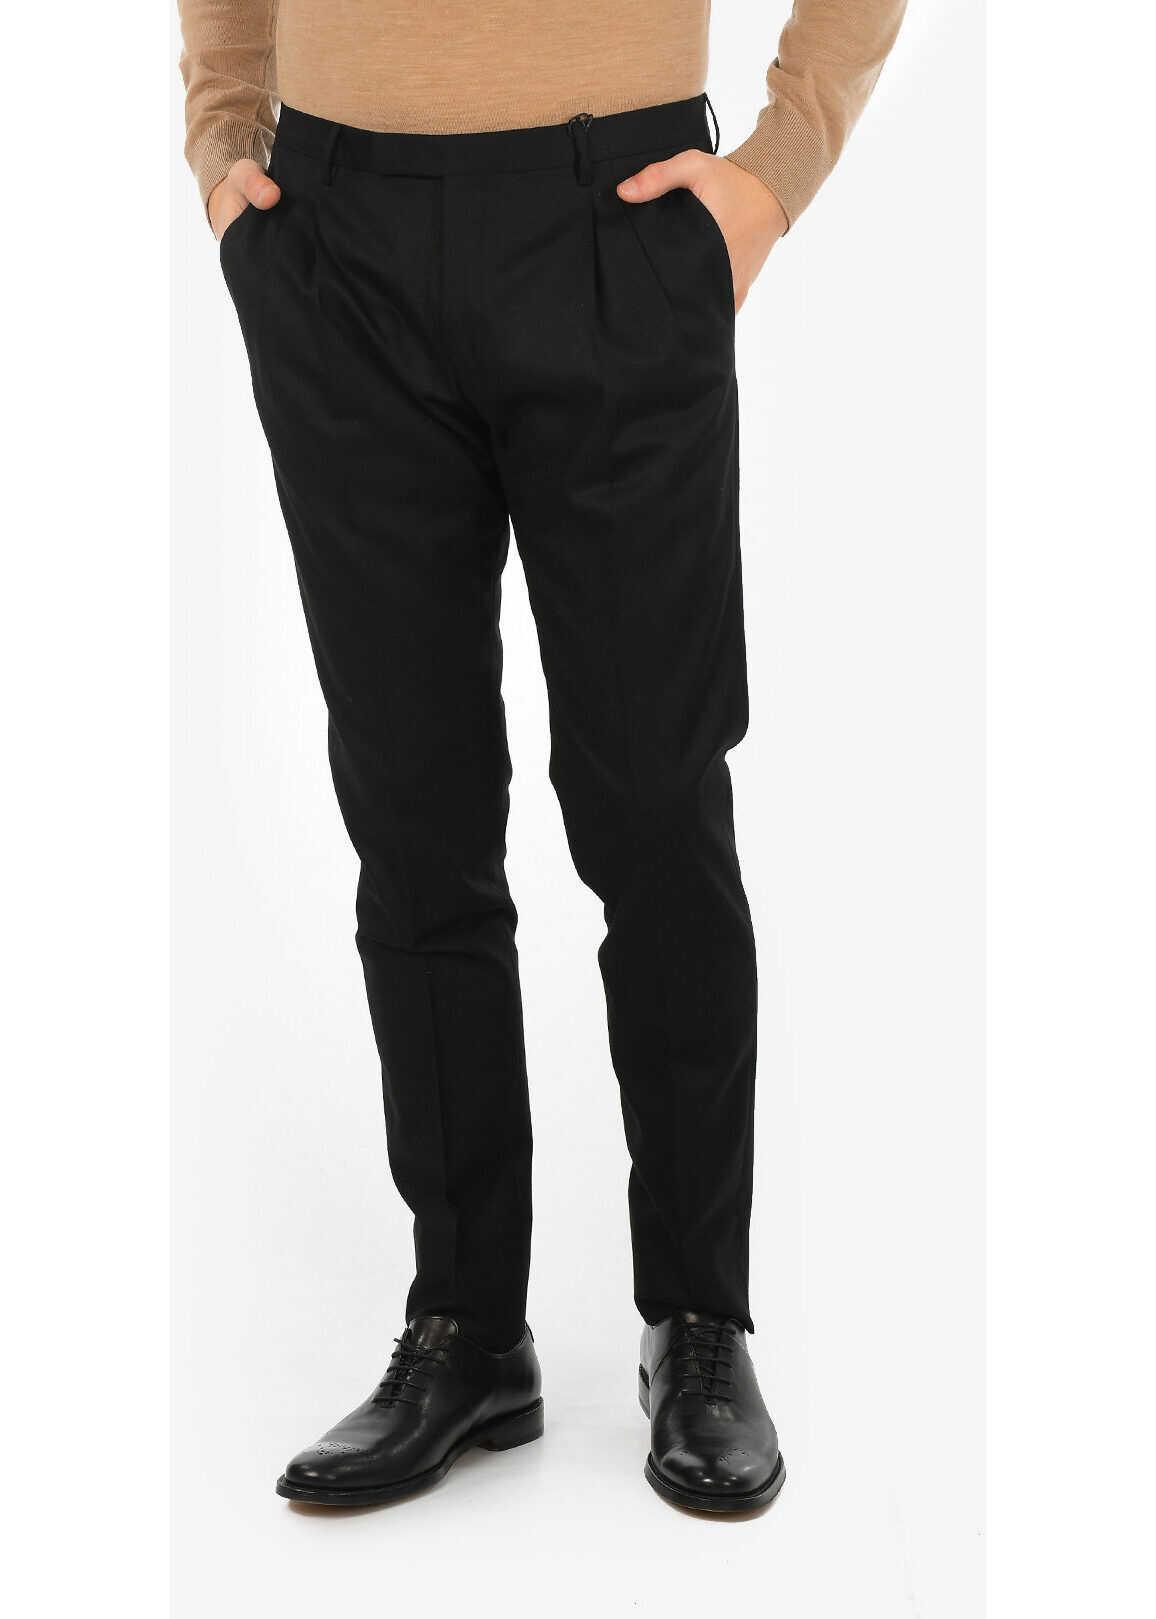 CORNELIANI CC COLLECTION virgin wool REWARD pants BLACK imagine